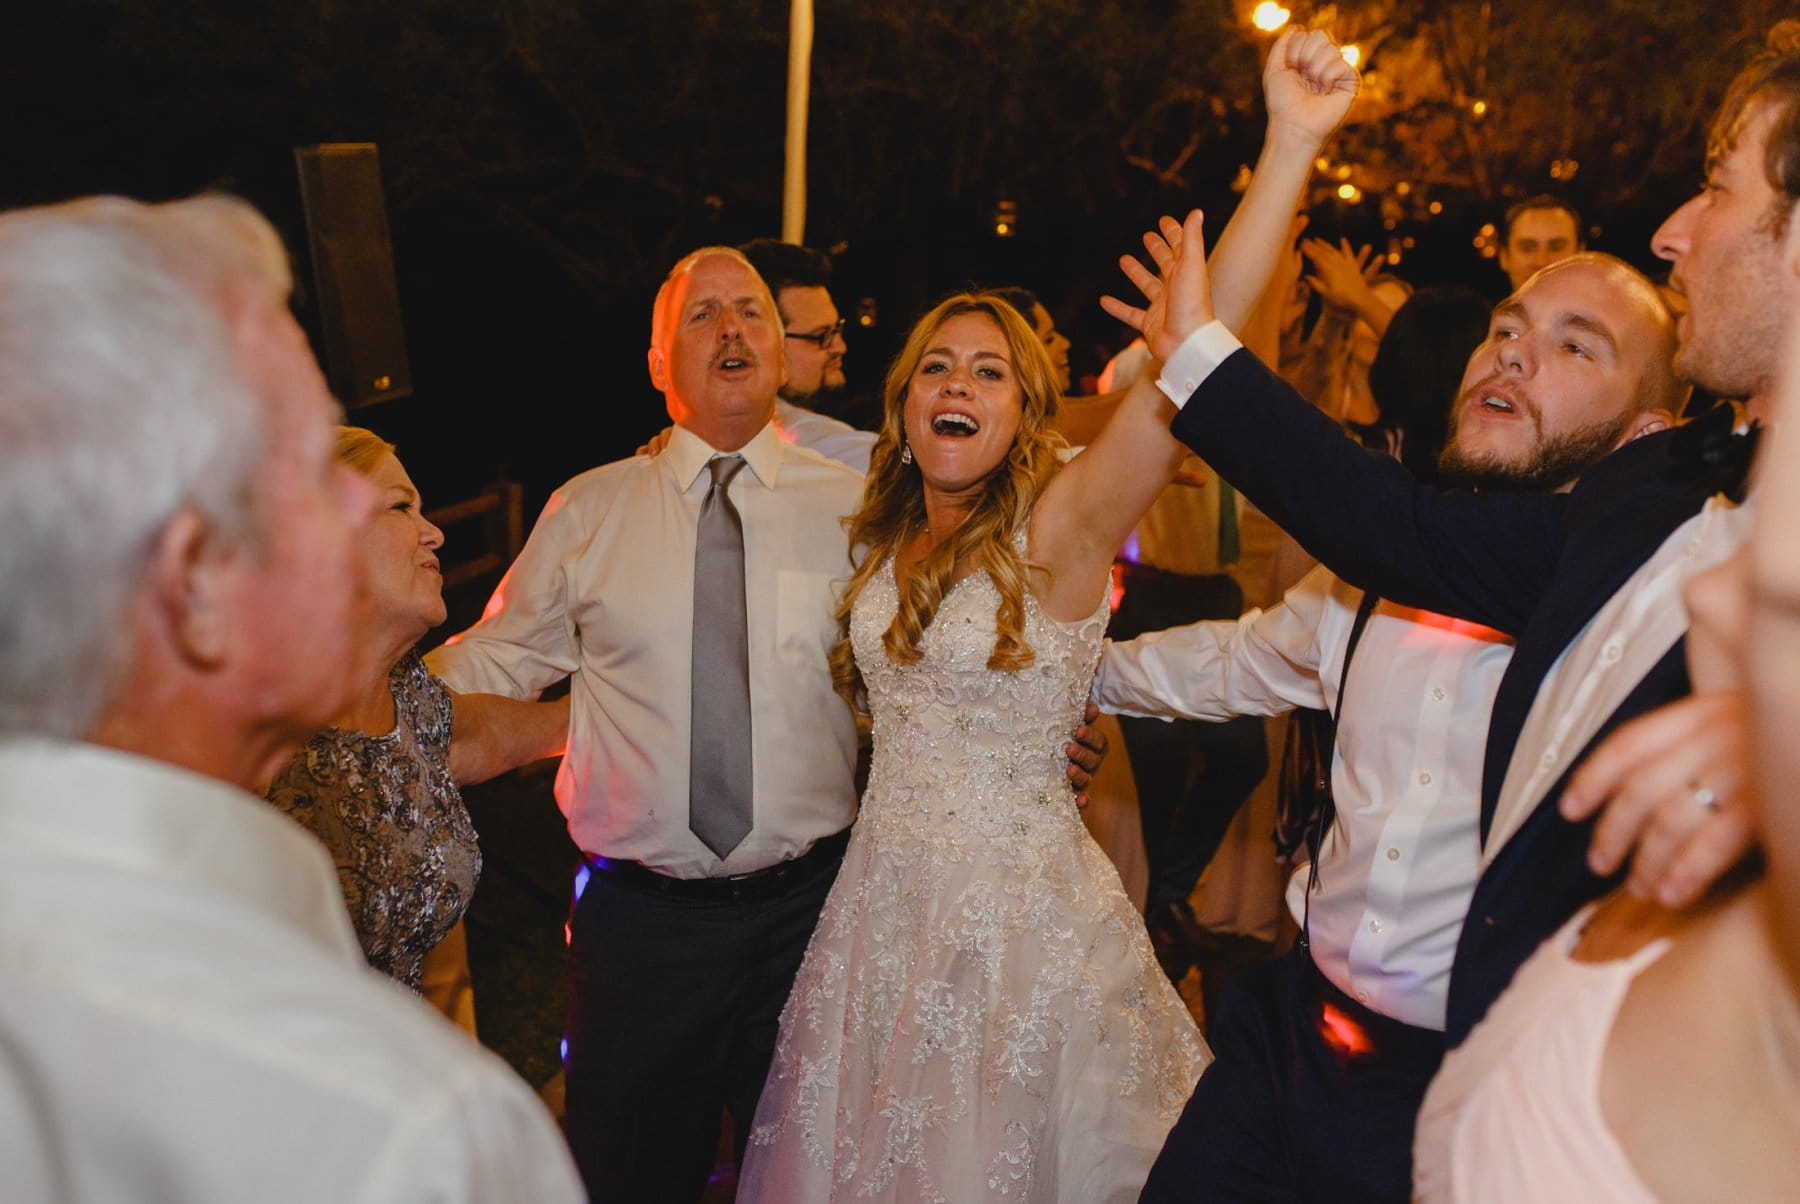 Saguaro Lake Ranch outdoor wedding reception